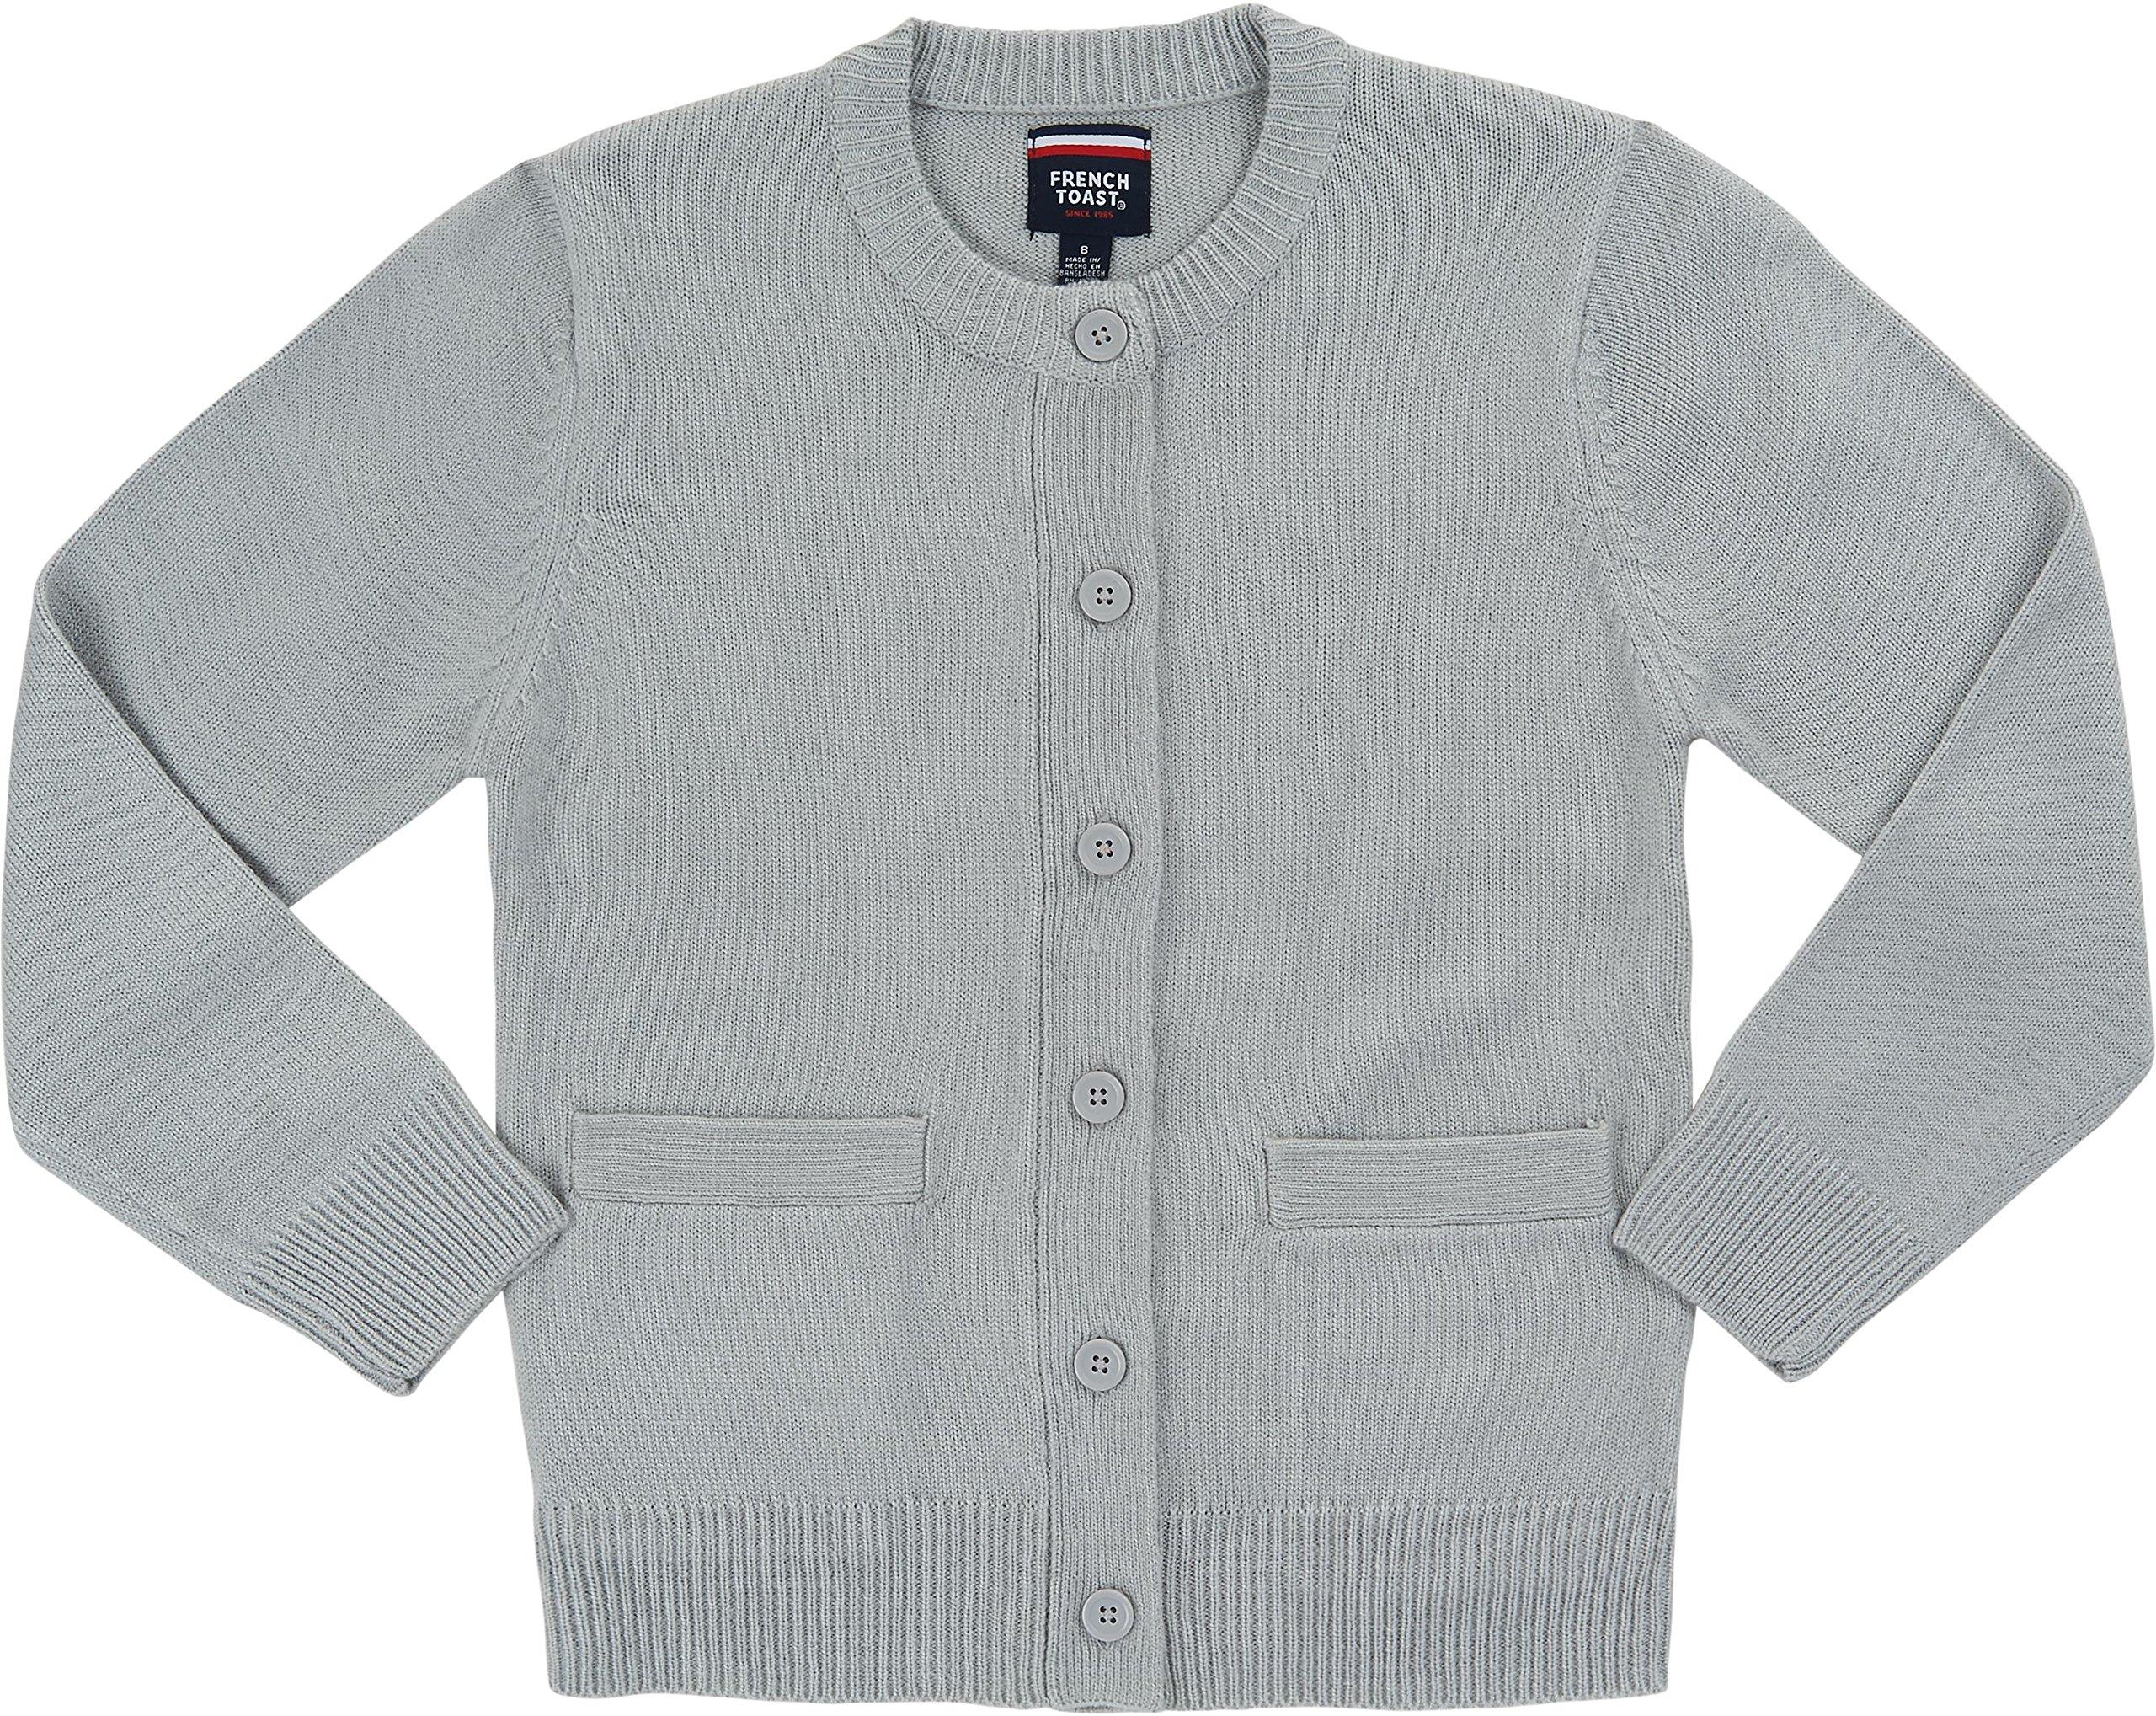 French Toast School Uniform Girls Anti-Pill Crew Neck Cardigan Sweater, Gray, Small (6/6X)